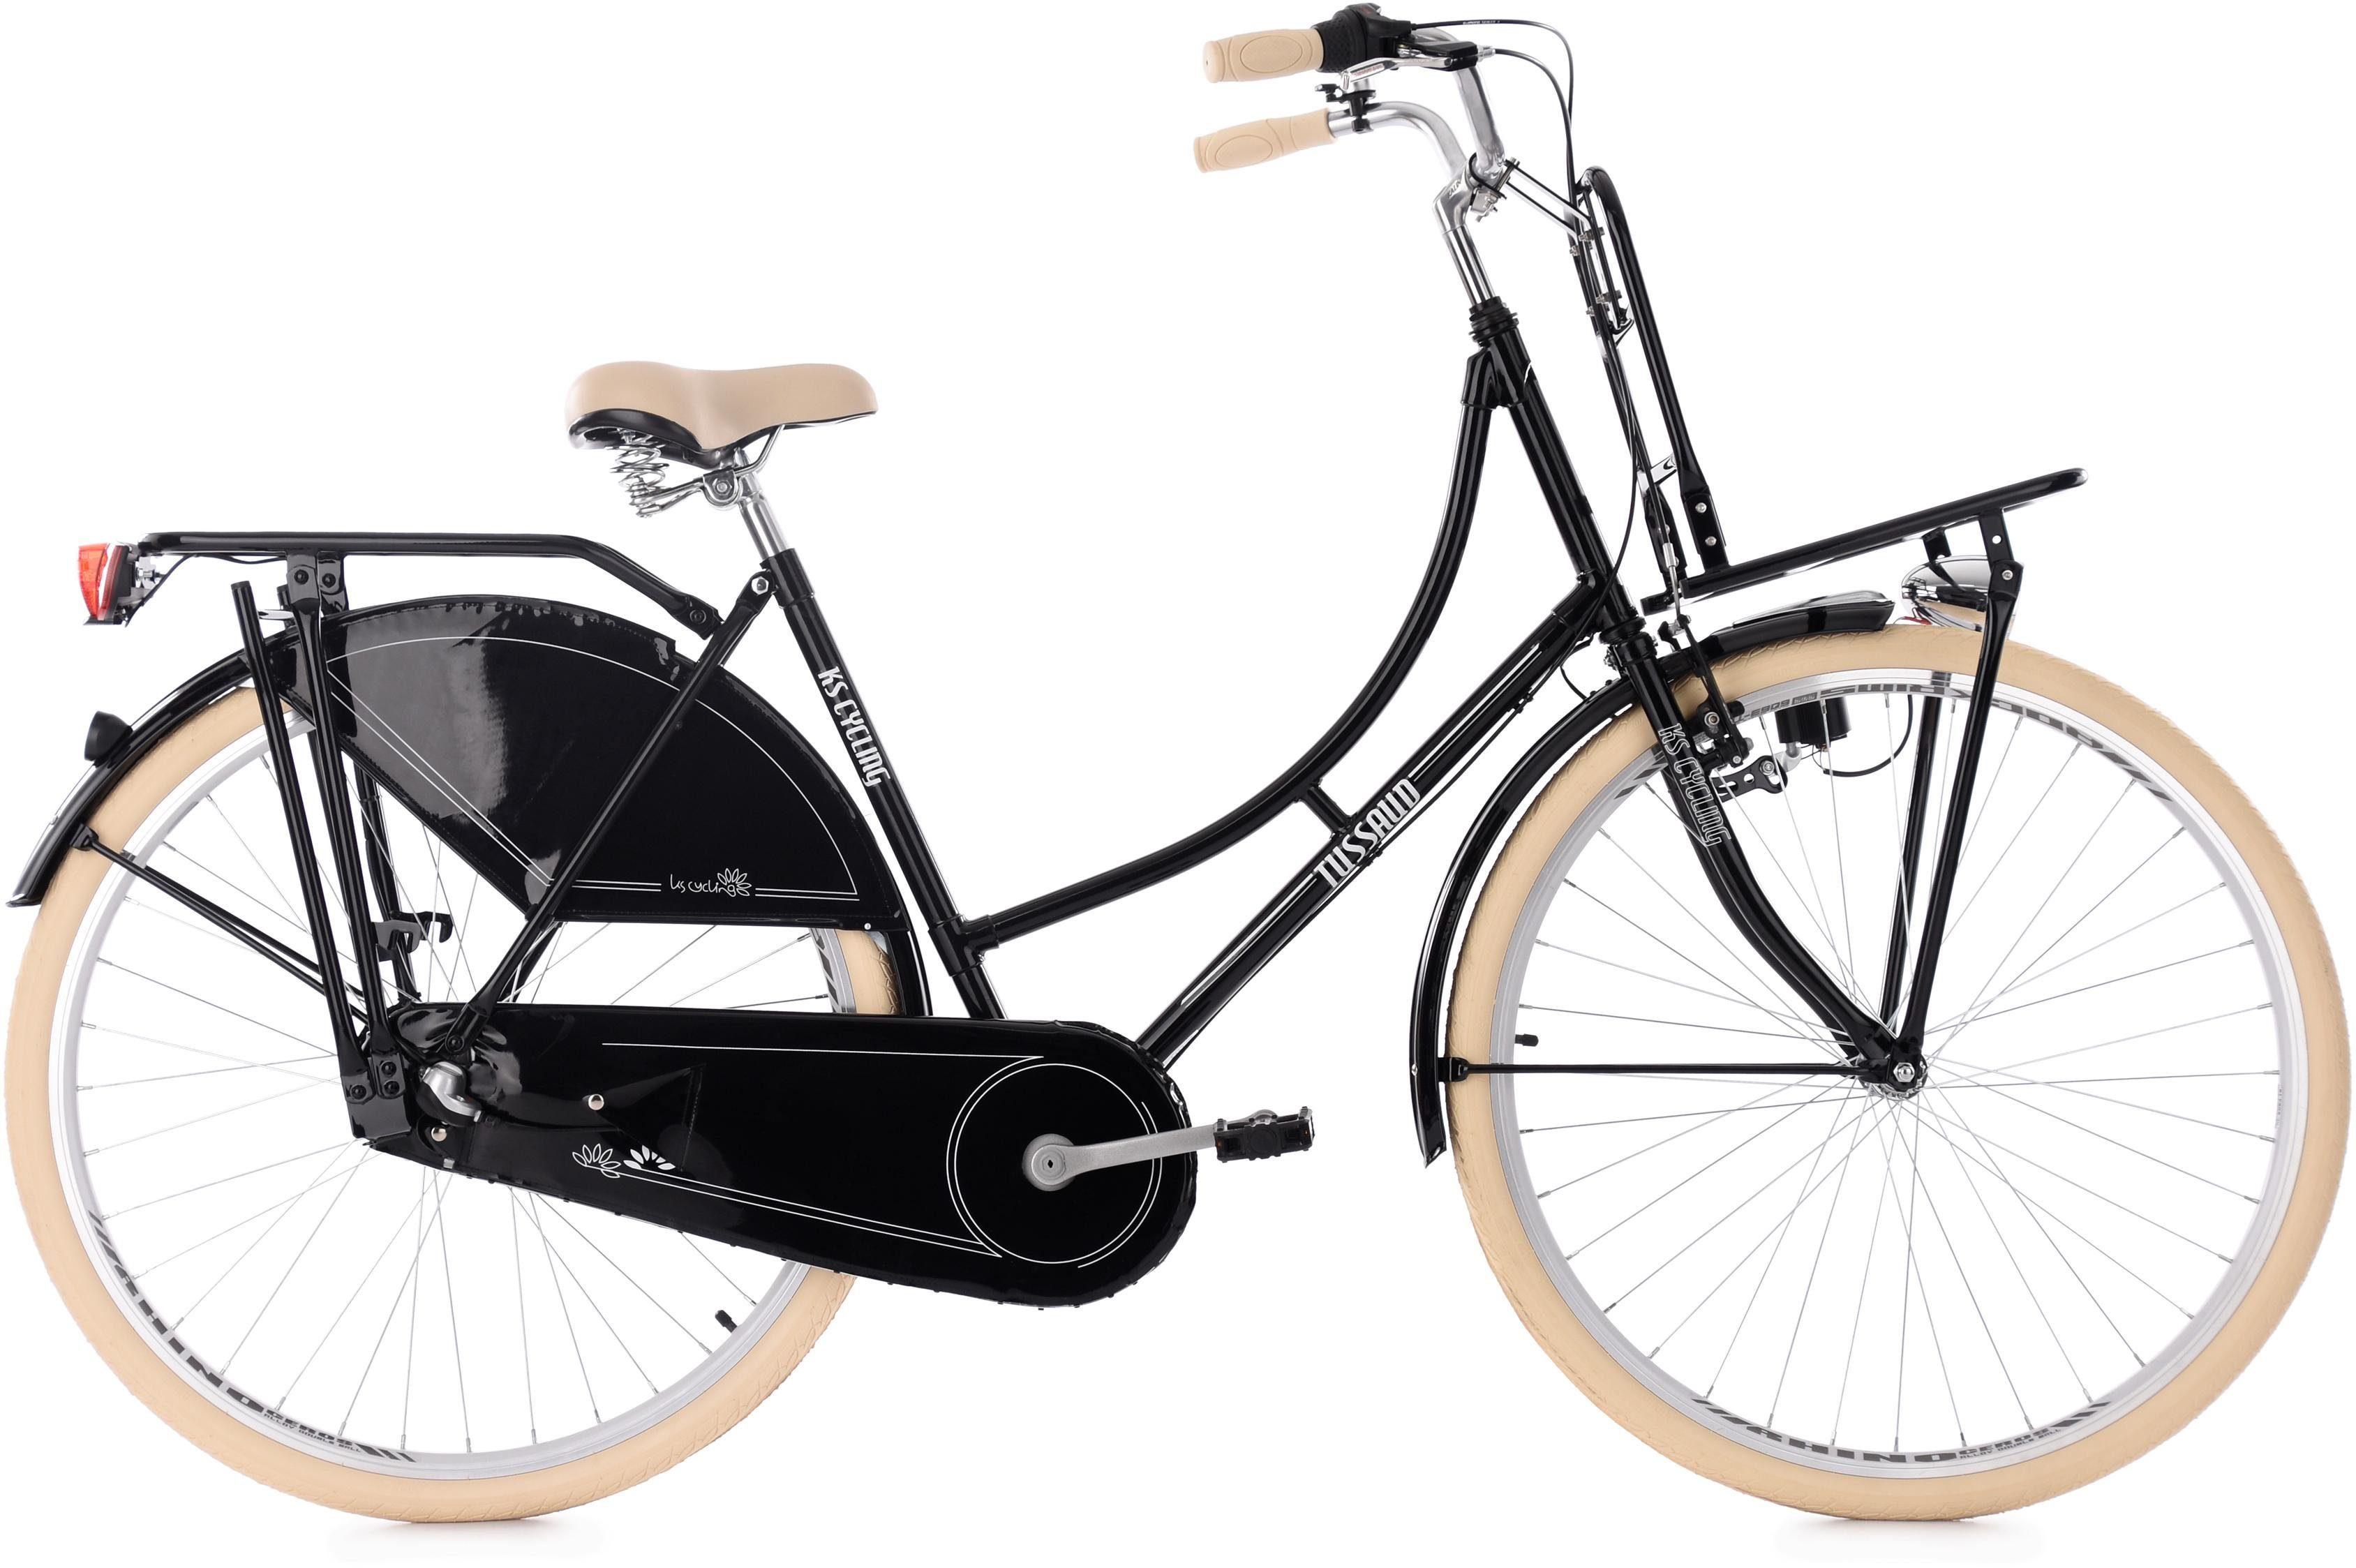 KS Cycling Hollandrad, 3 Gang Shimano Nexus Schaltwerk, Nabenschaltung